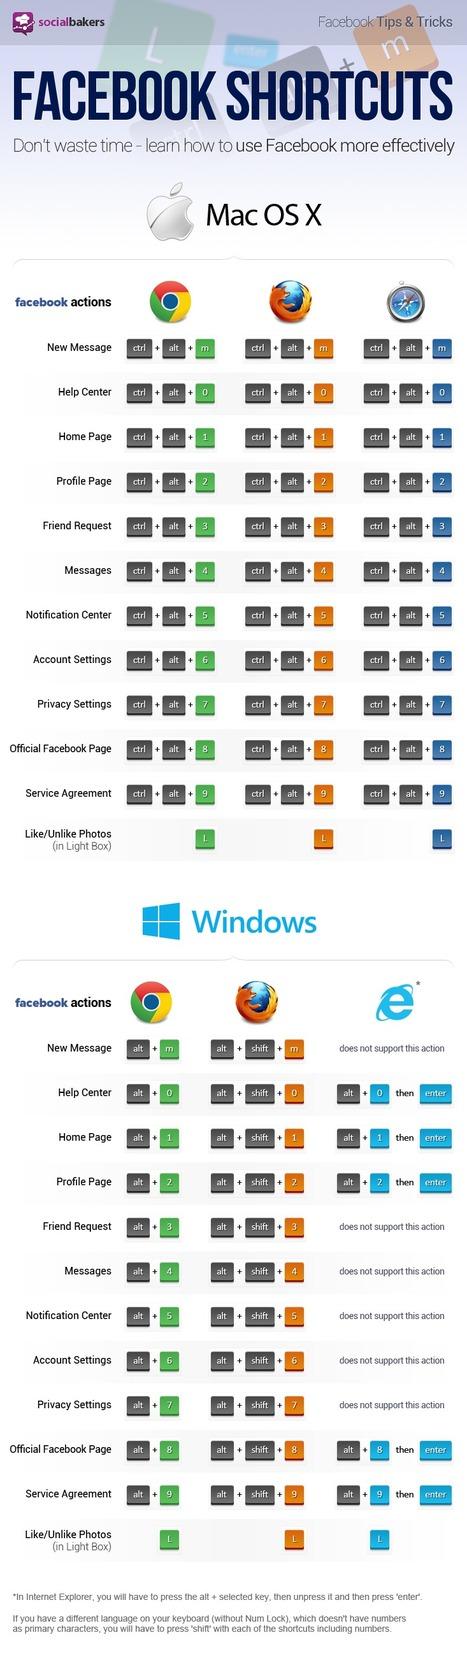 Les raccourcis clavier de Facebook - Murmure Persistant | infographie | Scoop.it